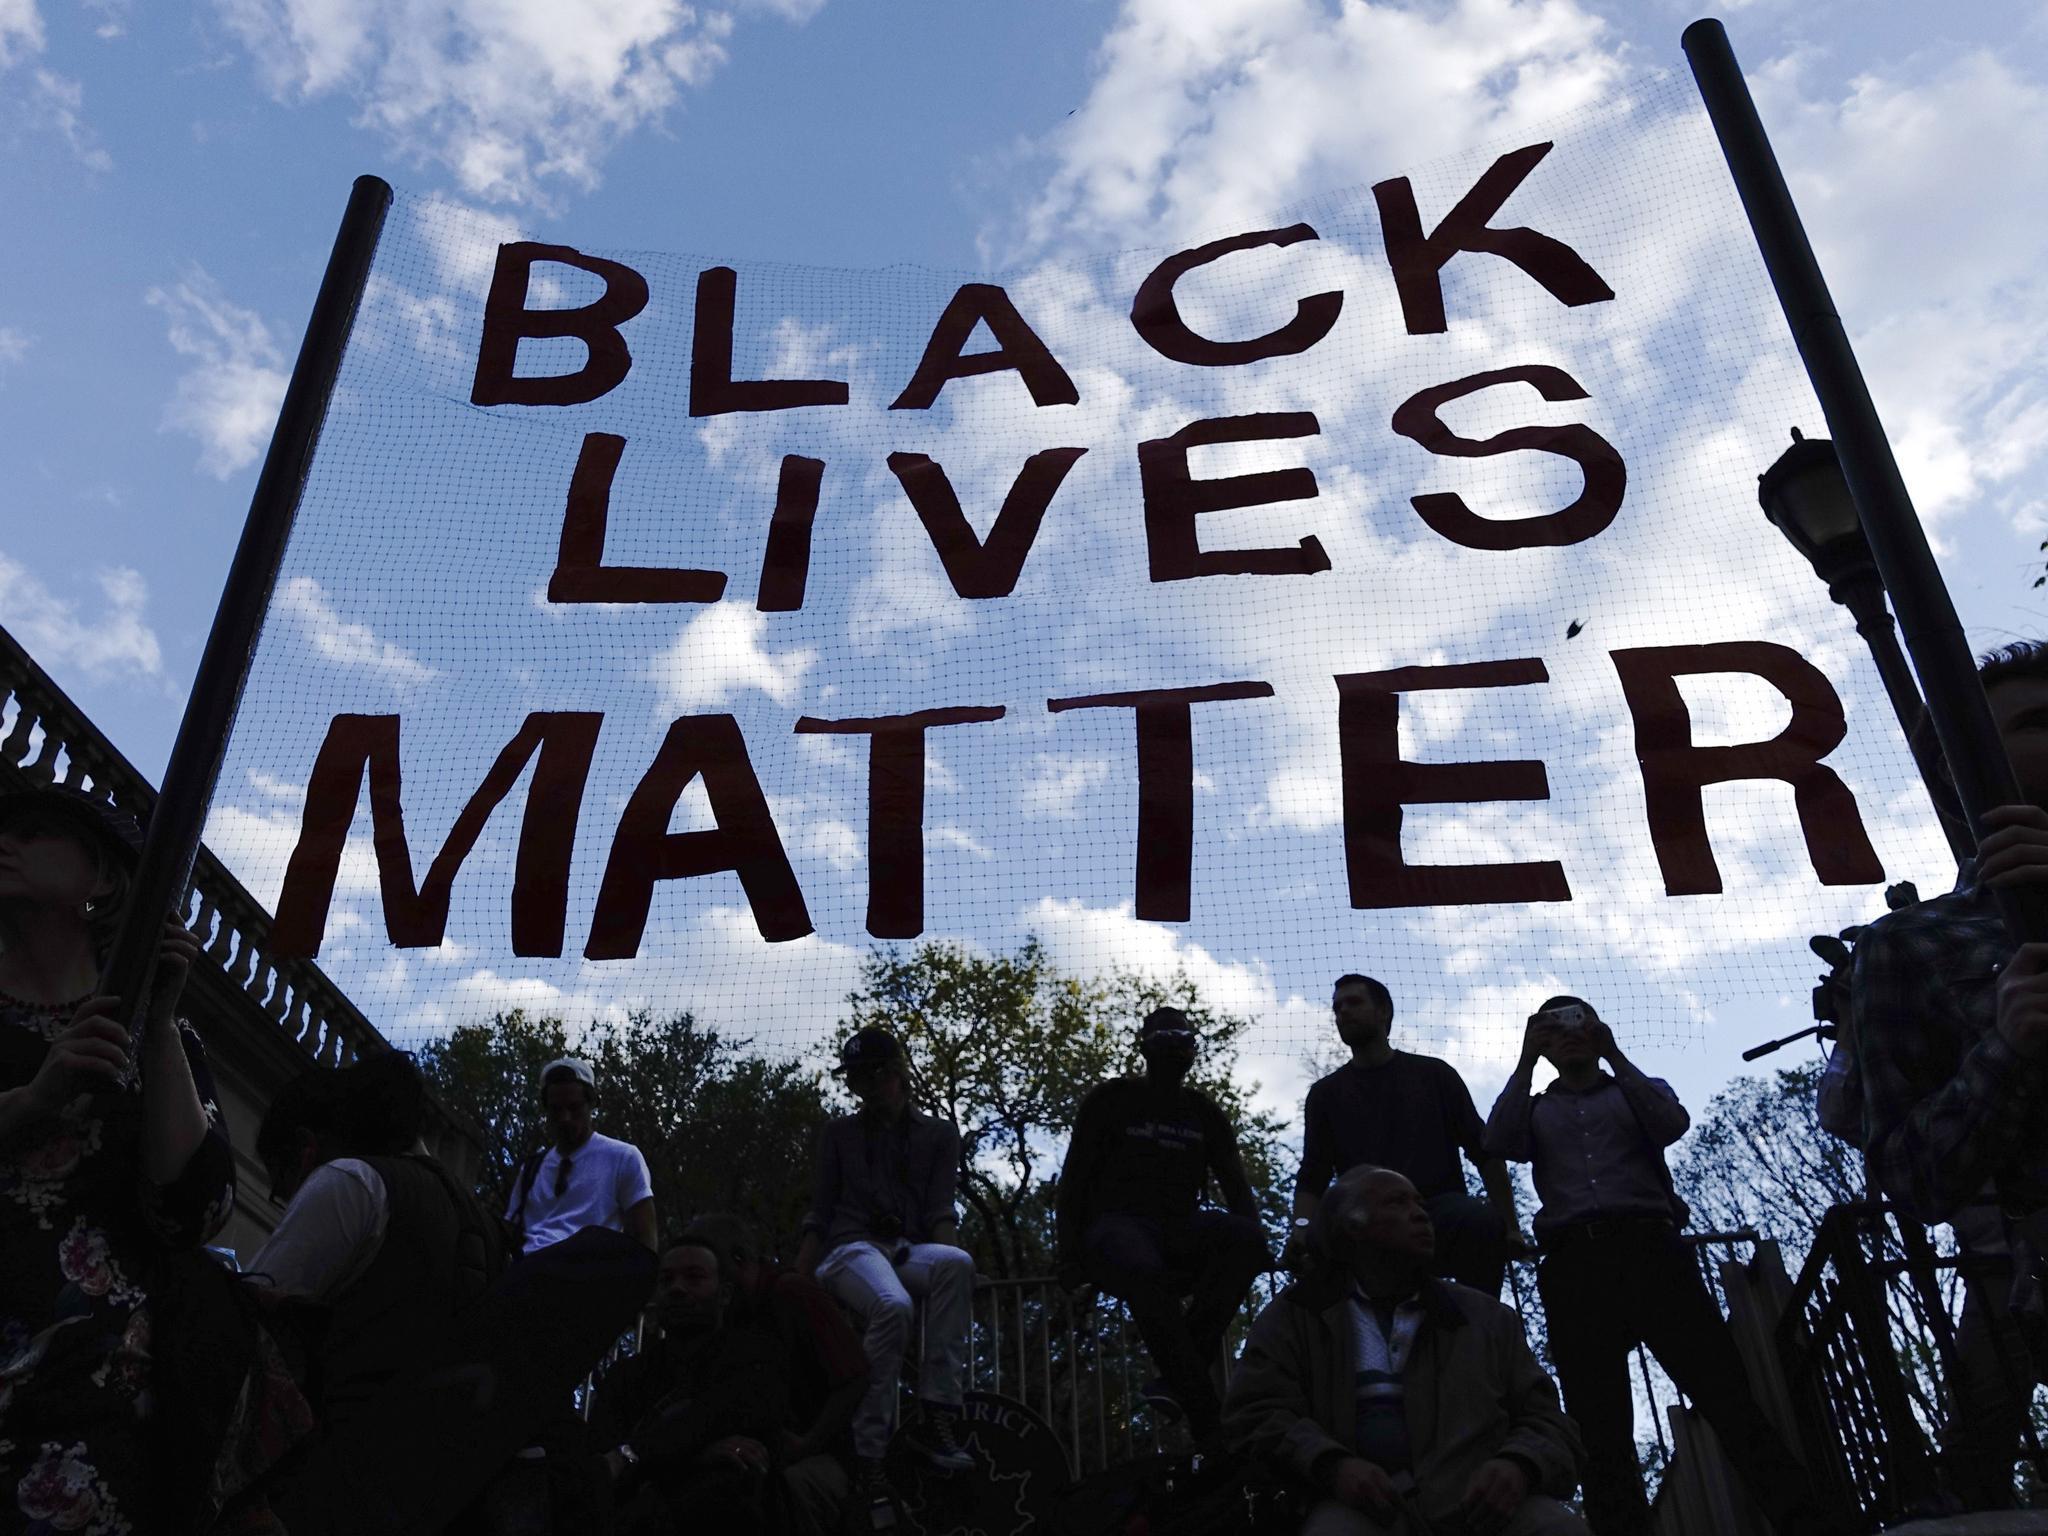 President Barack Obama rejects petition to designate Black Lives Matter as a terrorist organisation